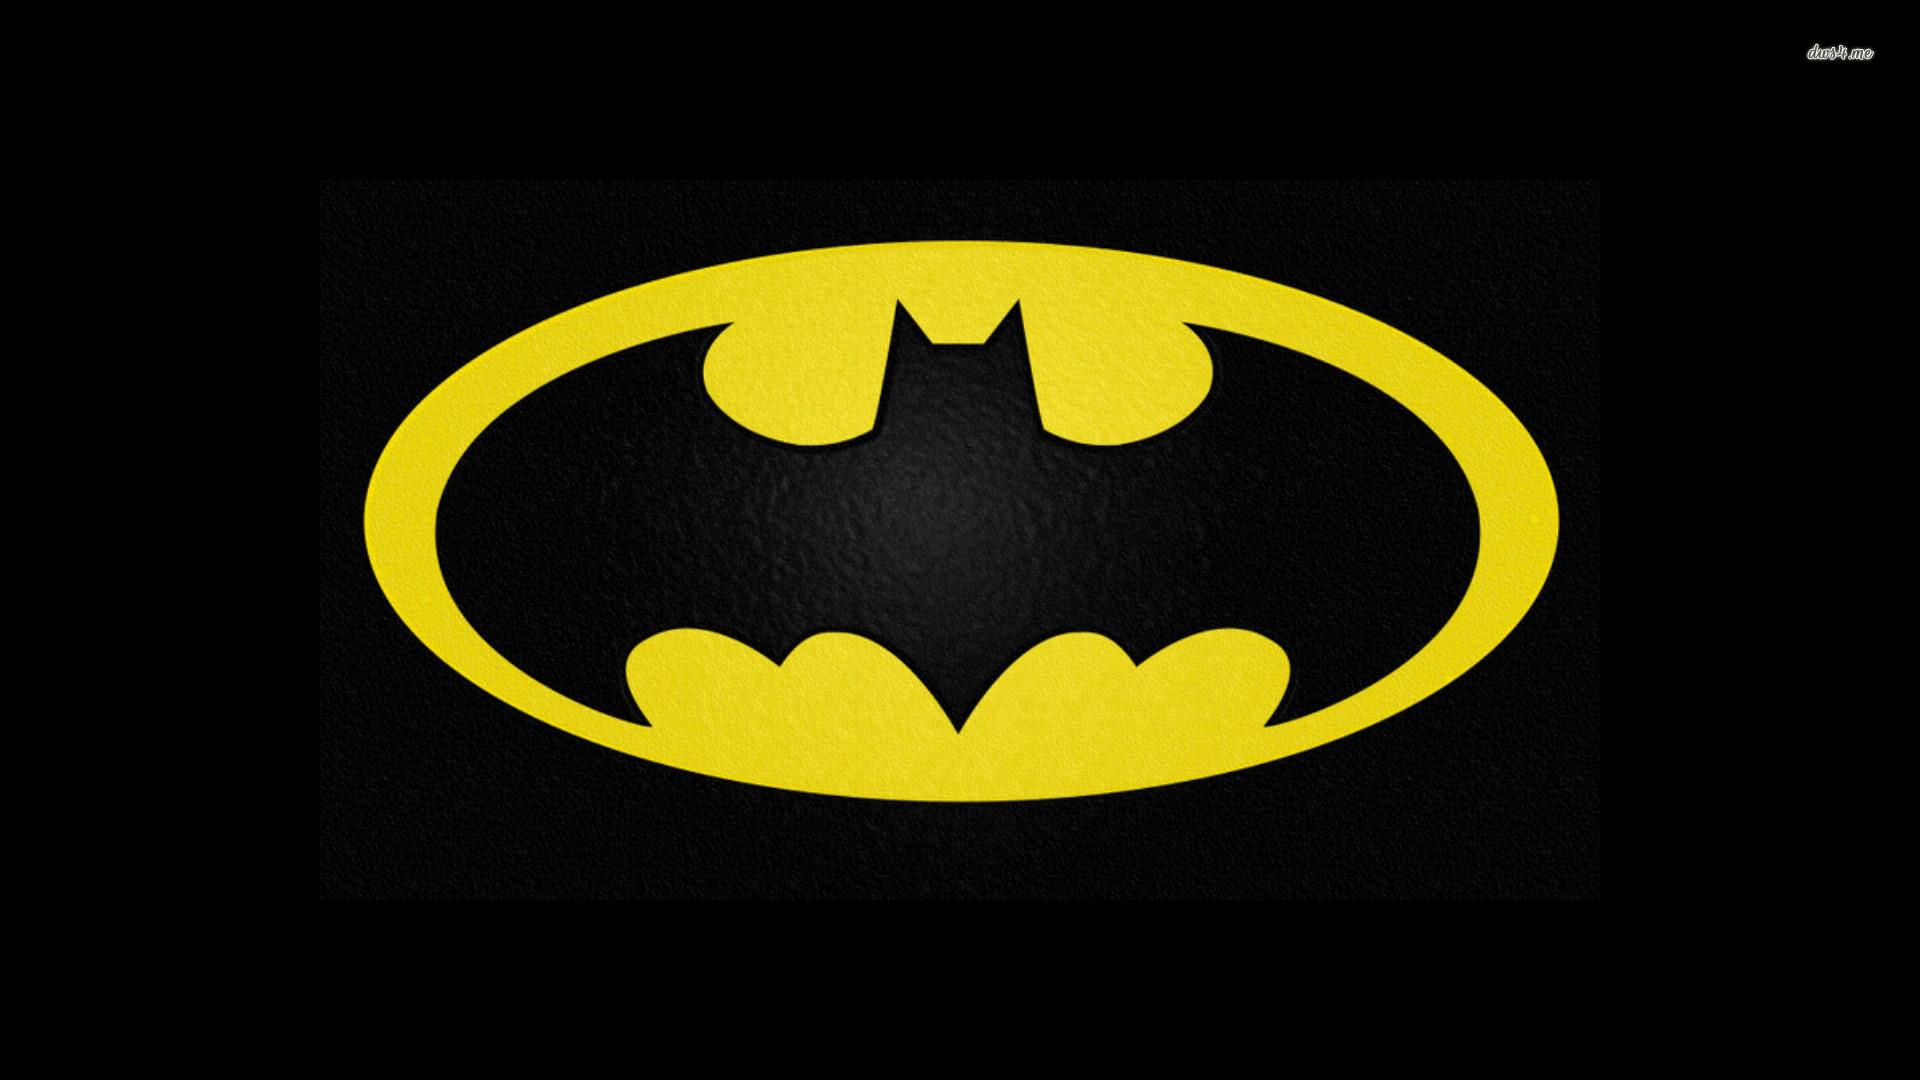 Batman logo wallpaper – Movie wallpapers – #8411